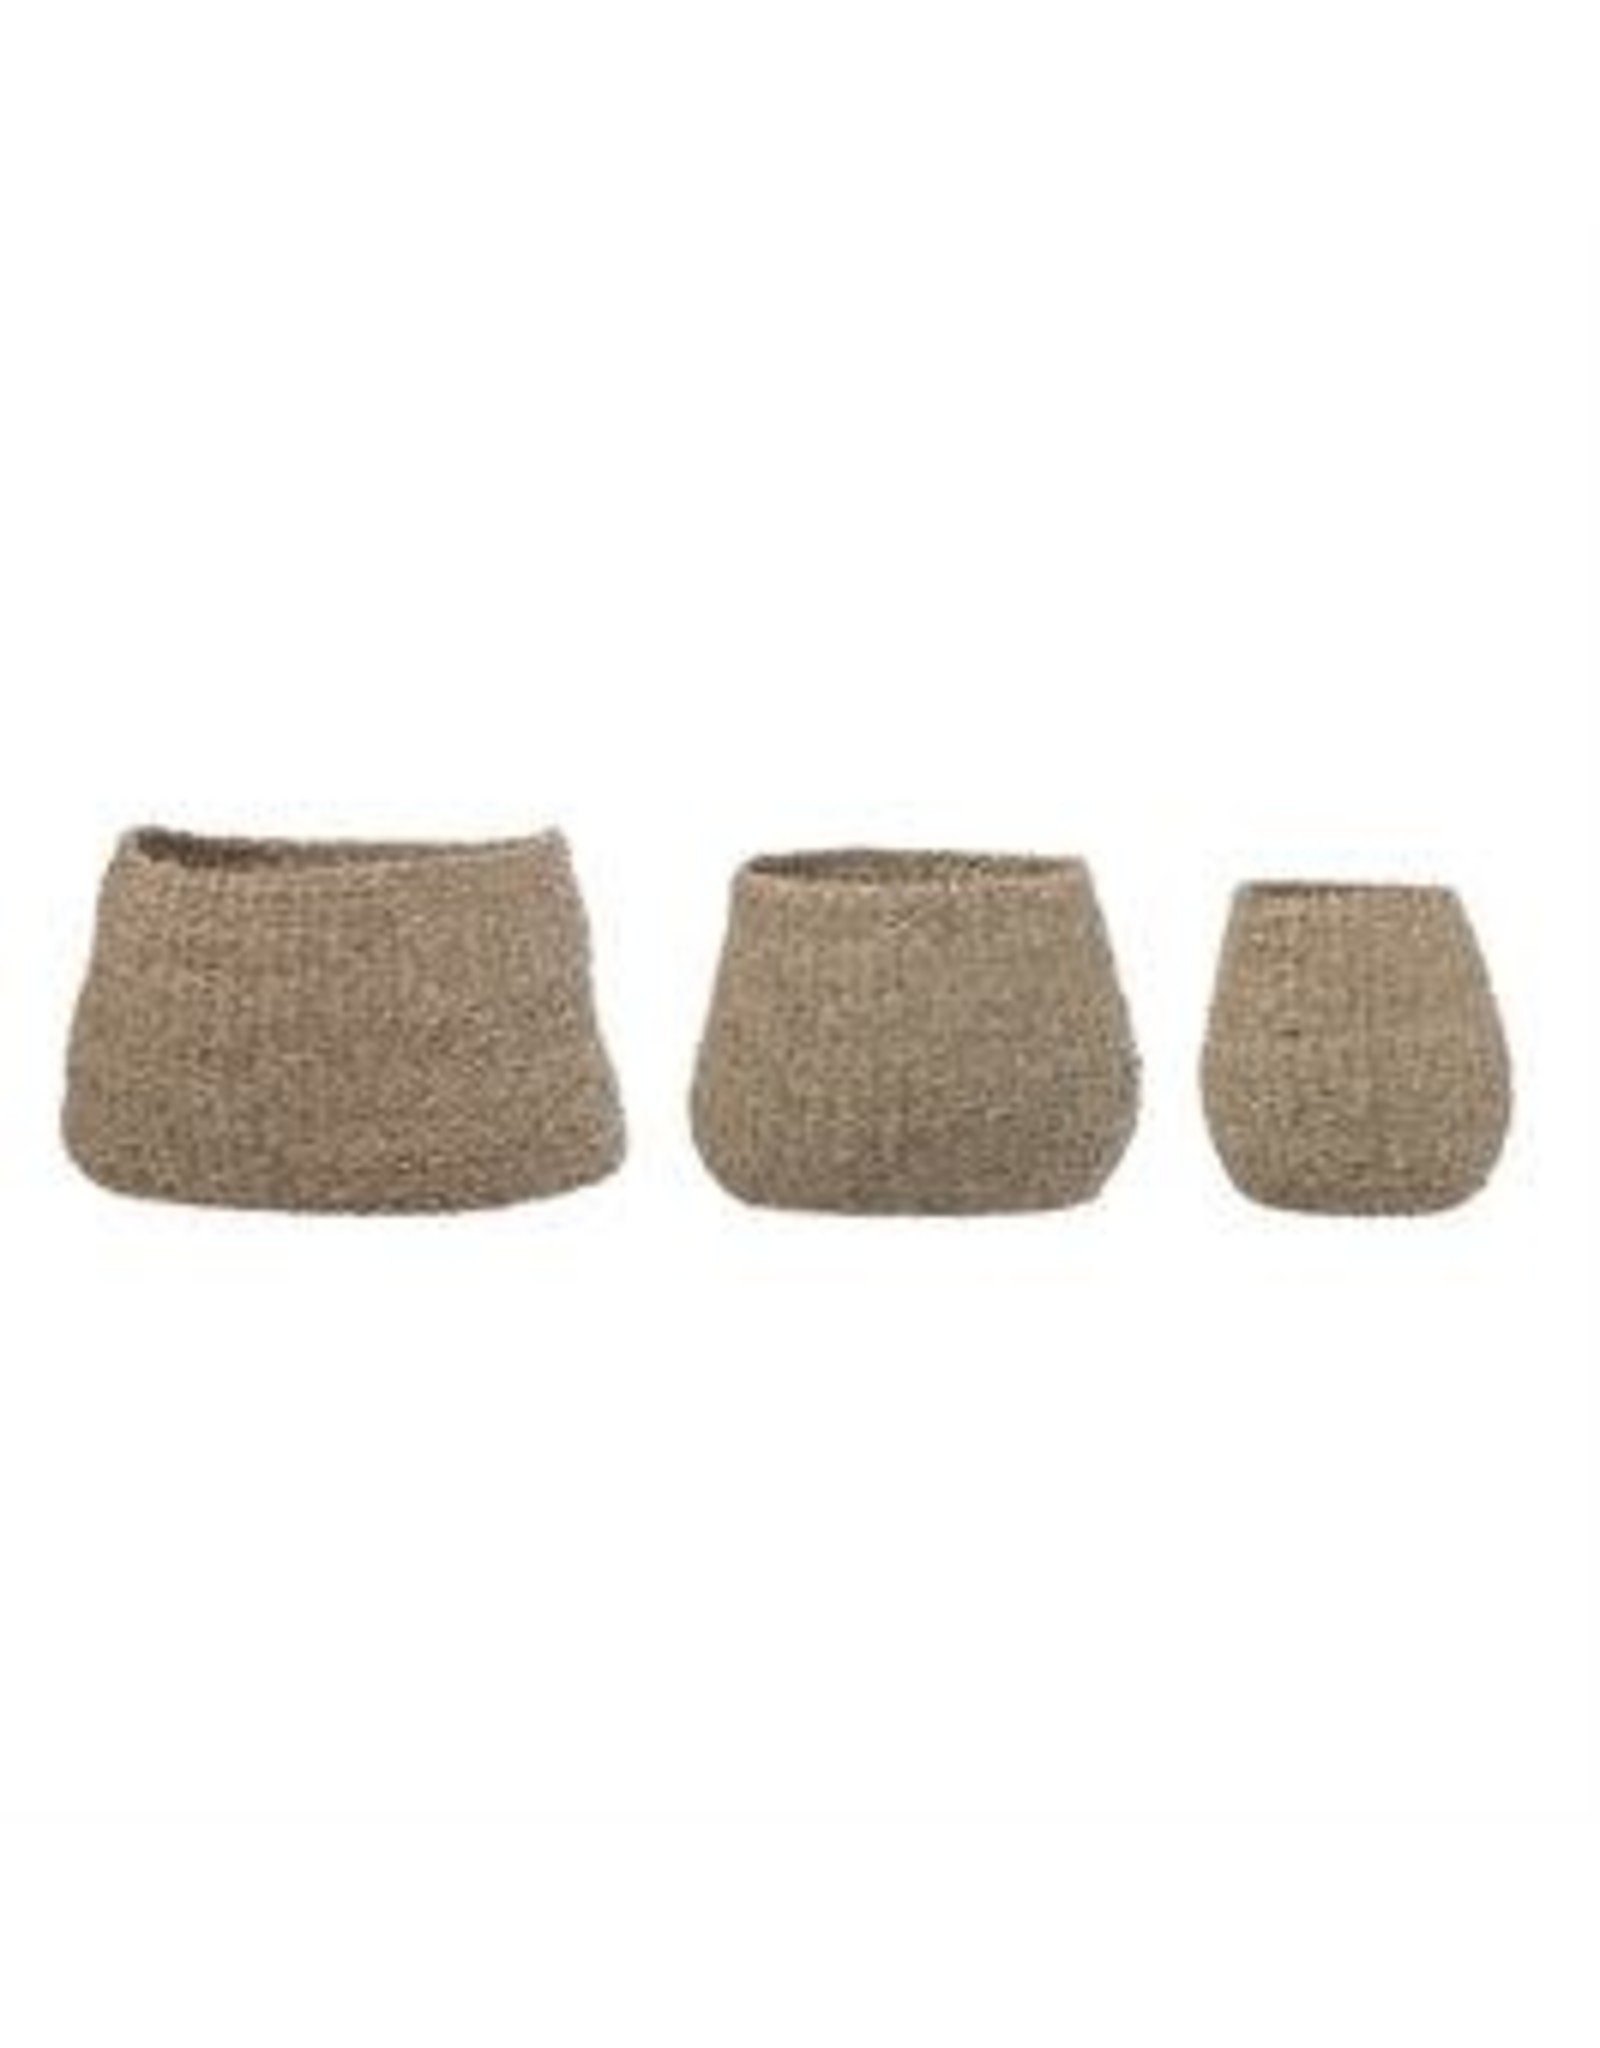 Website Natural Seagrass Baskets